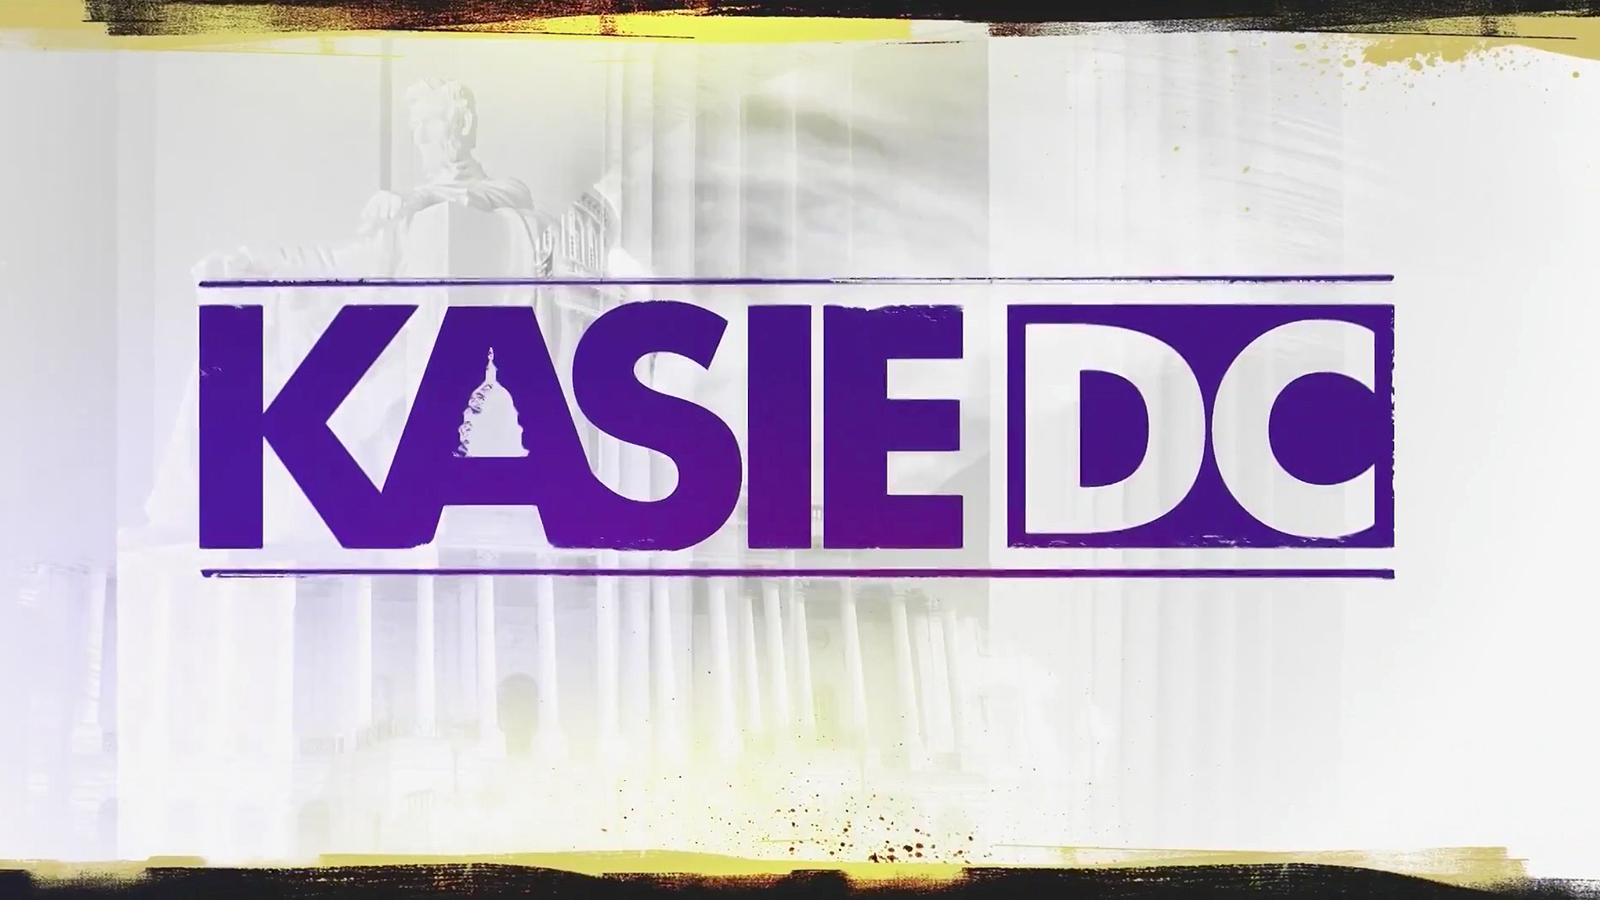 ncs_kasie-dc-motion-graphics-msnbc_0005